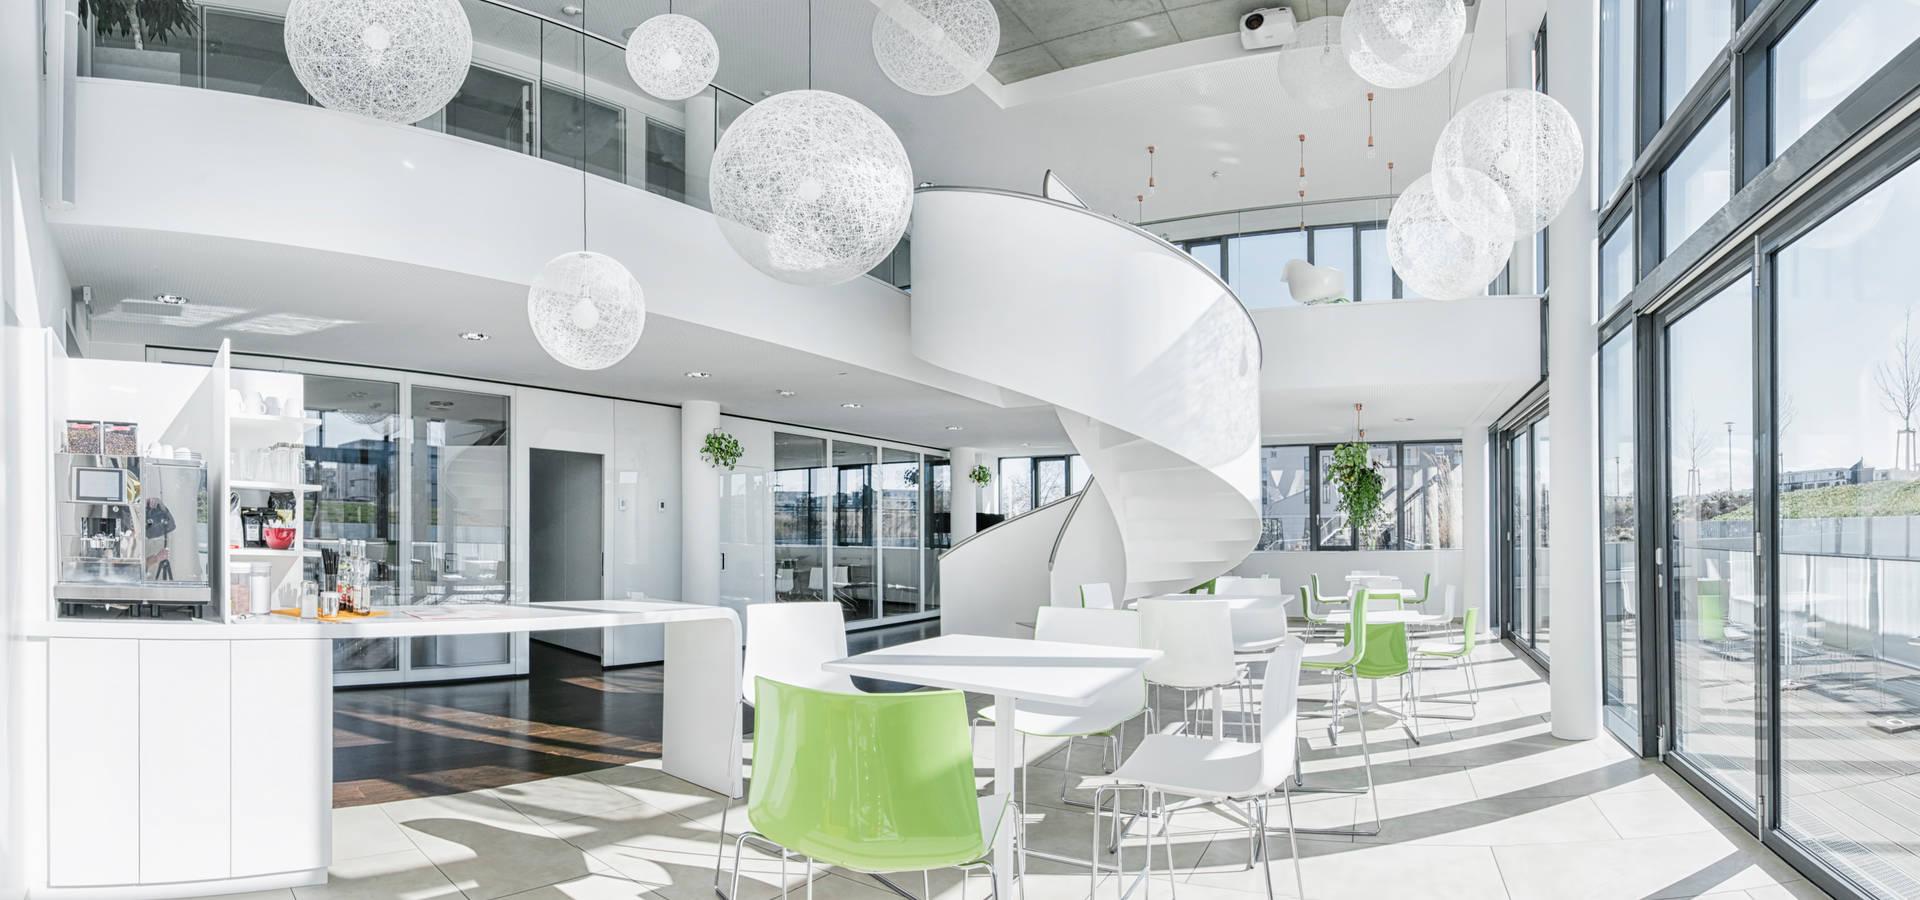 Kaldma Interiors—Interior Design aus Karlsruhe